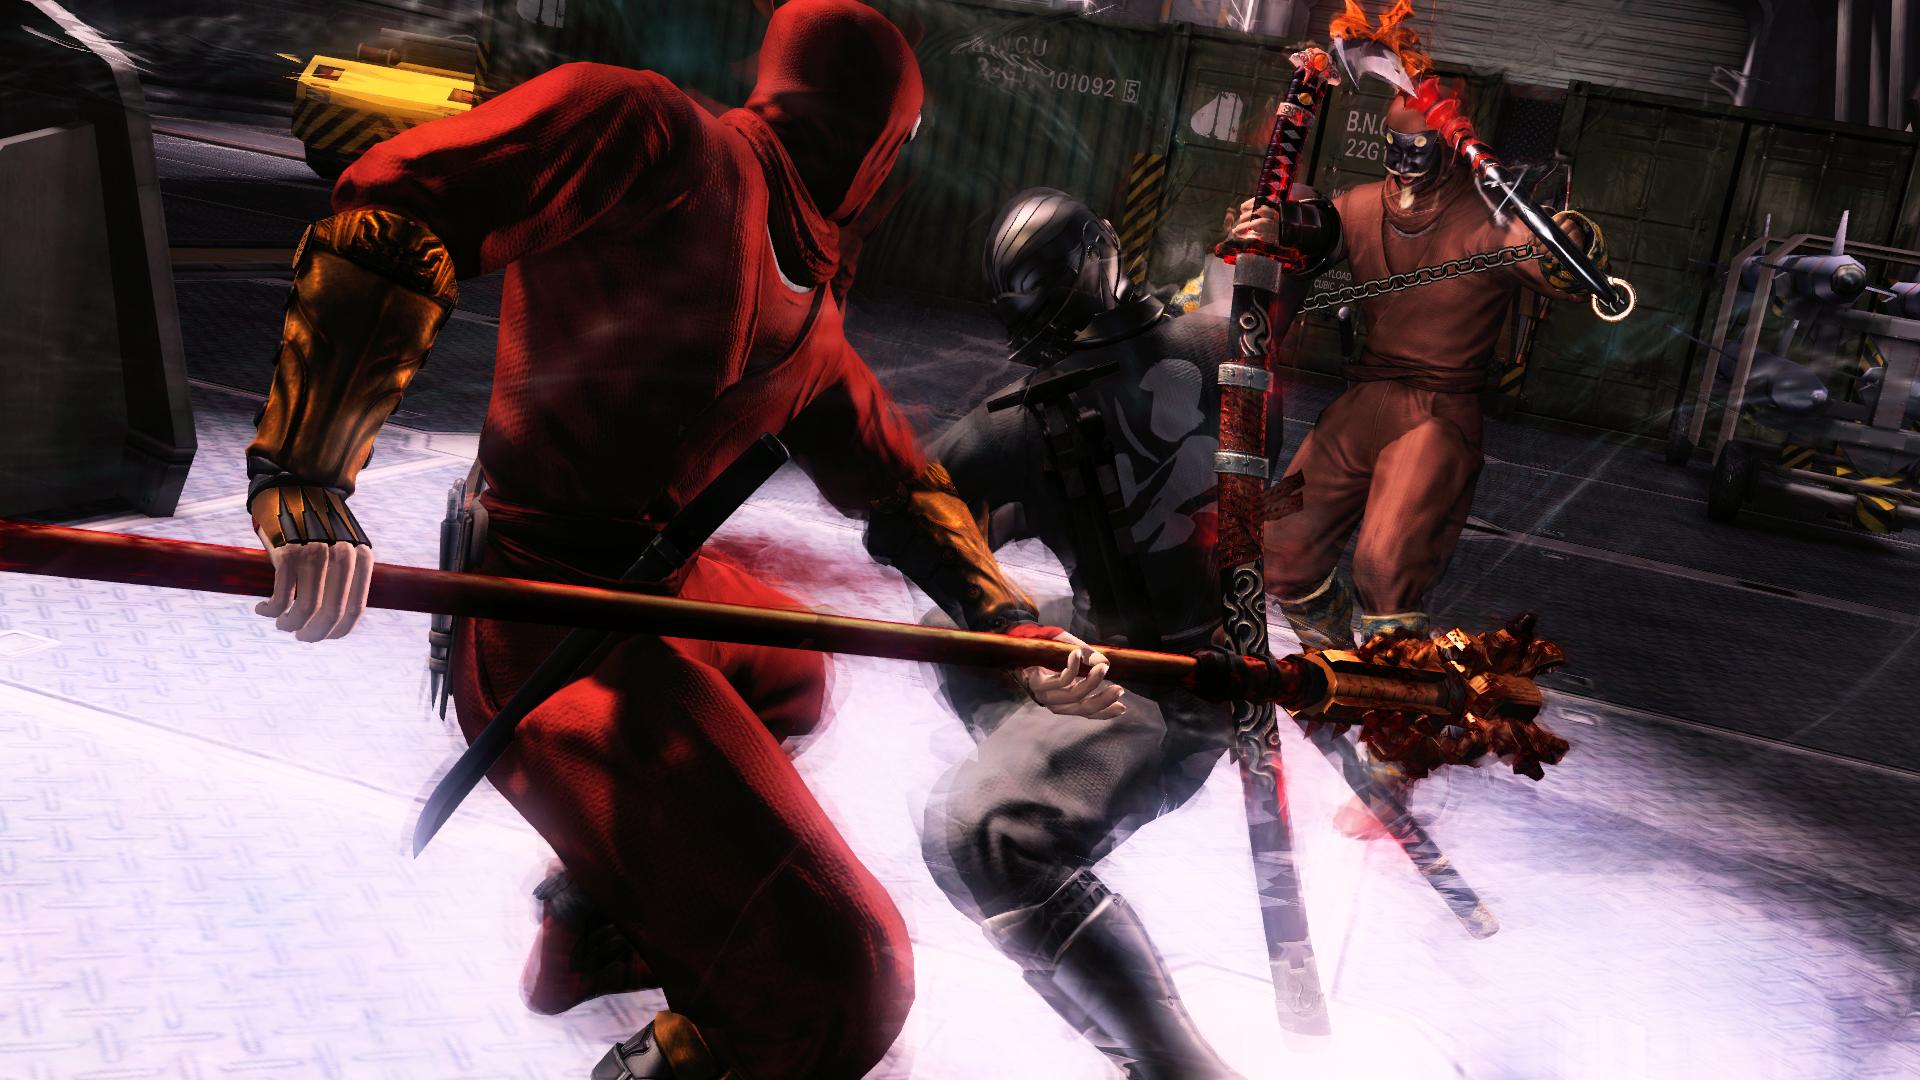 Ninja Gaiden 3 Razor S Edge Is Less Dull But Still Not Quite Sharp Siliconera